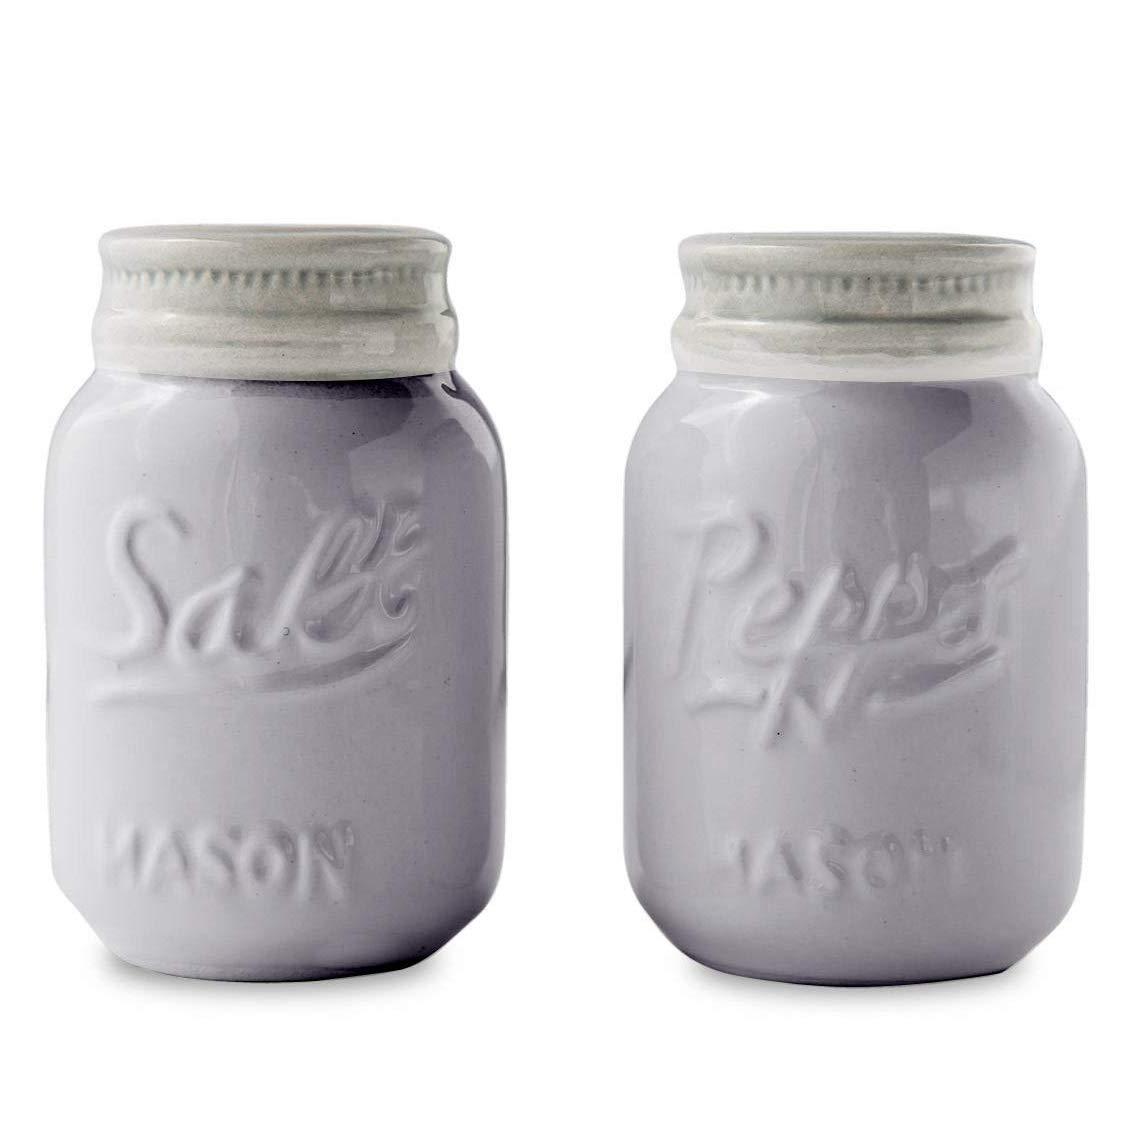 Comfify Vintage Mason Jar Salt & Pepper Shakers Adorable Decorative Mason Jar Decor for Vintage, Rustic, Shabby Chic - Sturdy Ceramic in Grey - 3.5 oz. Cap.